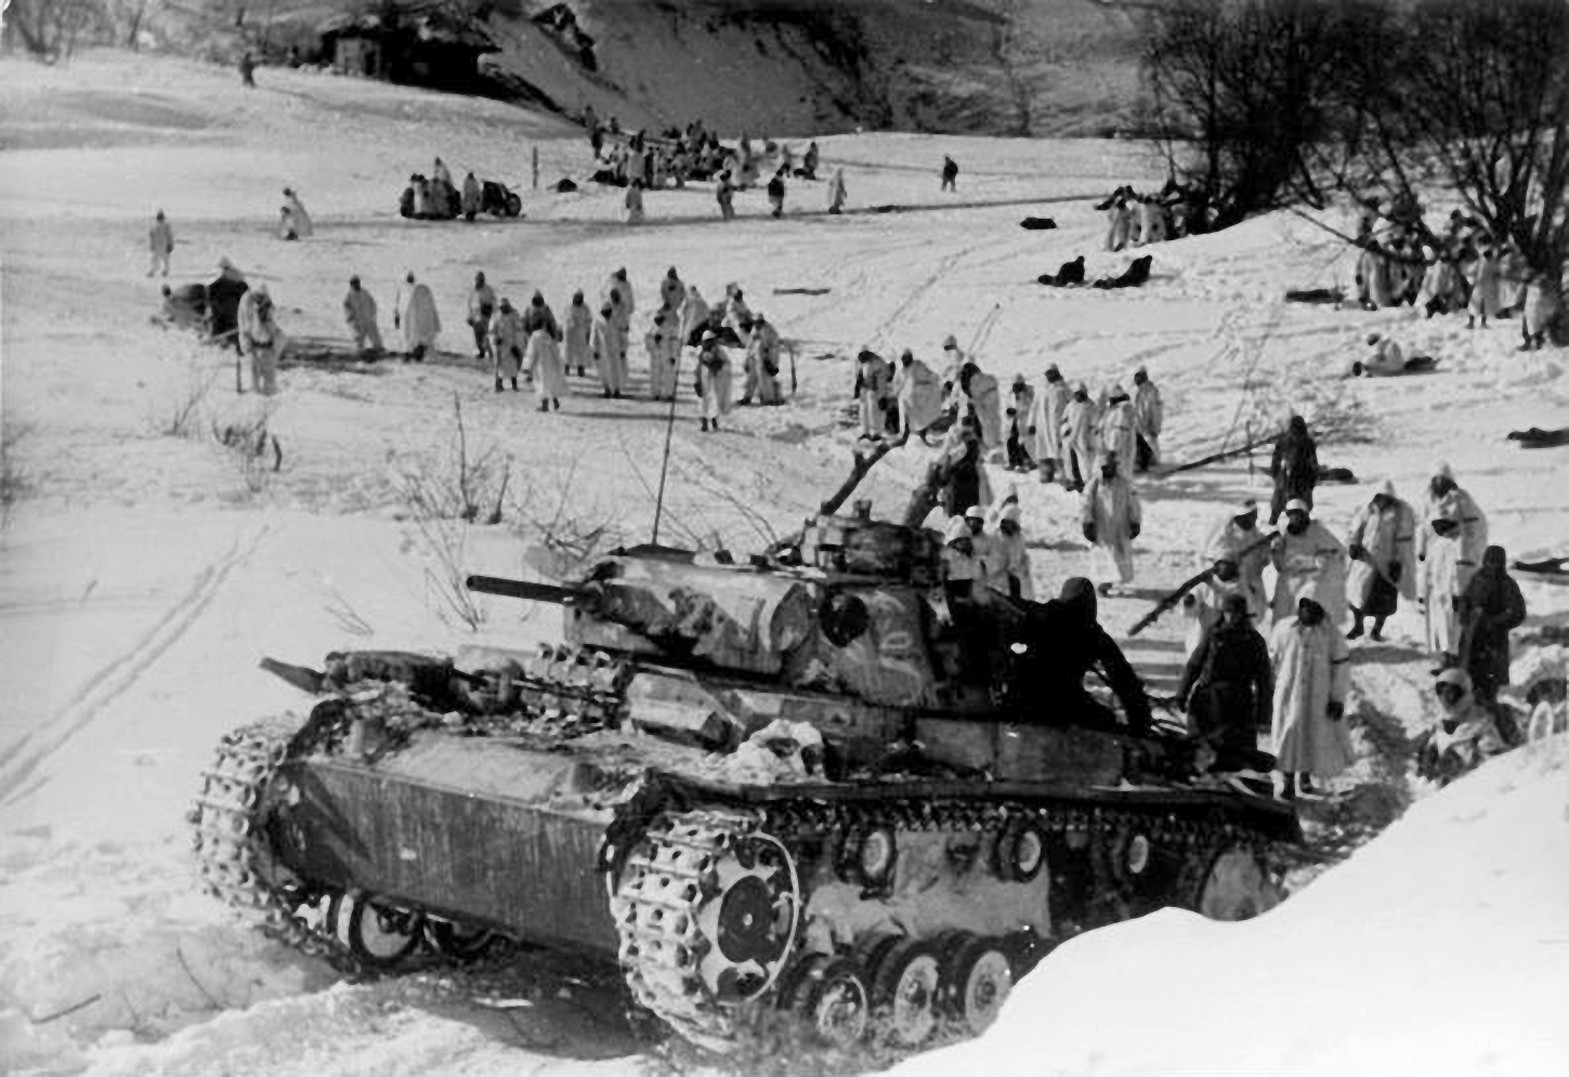 Ebook Perang Dunia 2